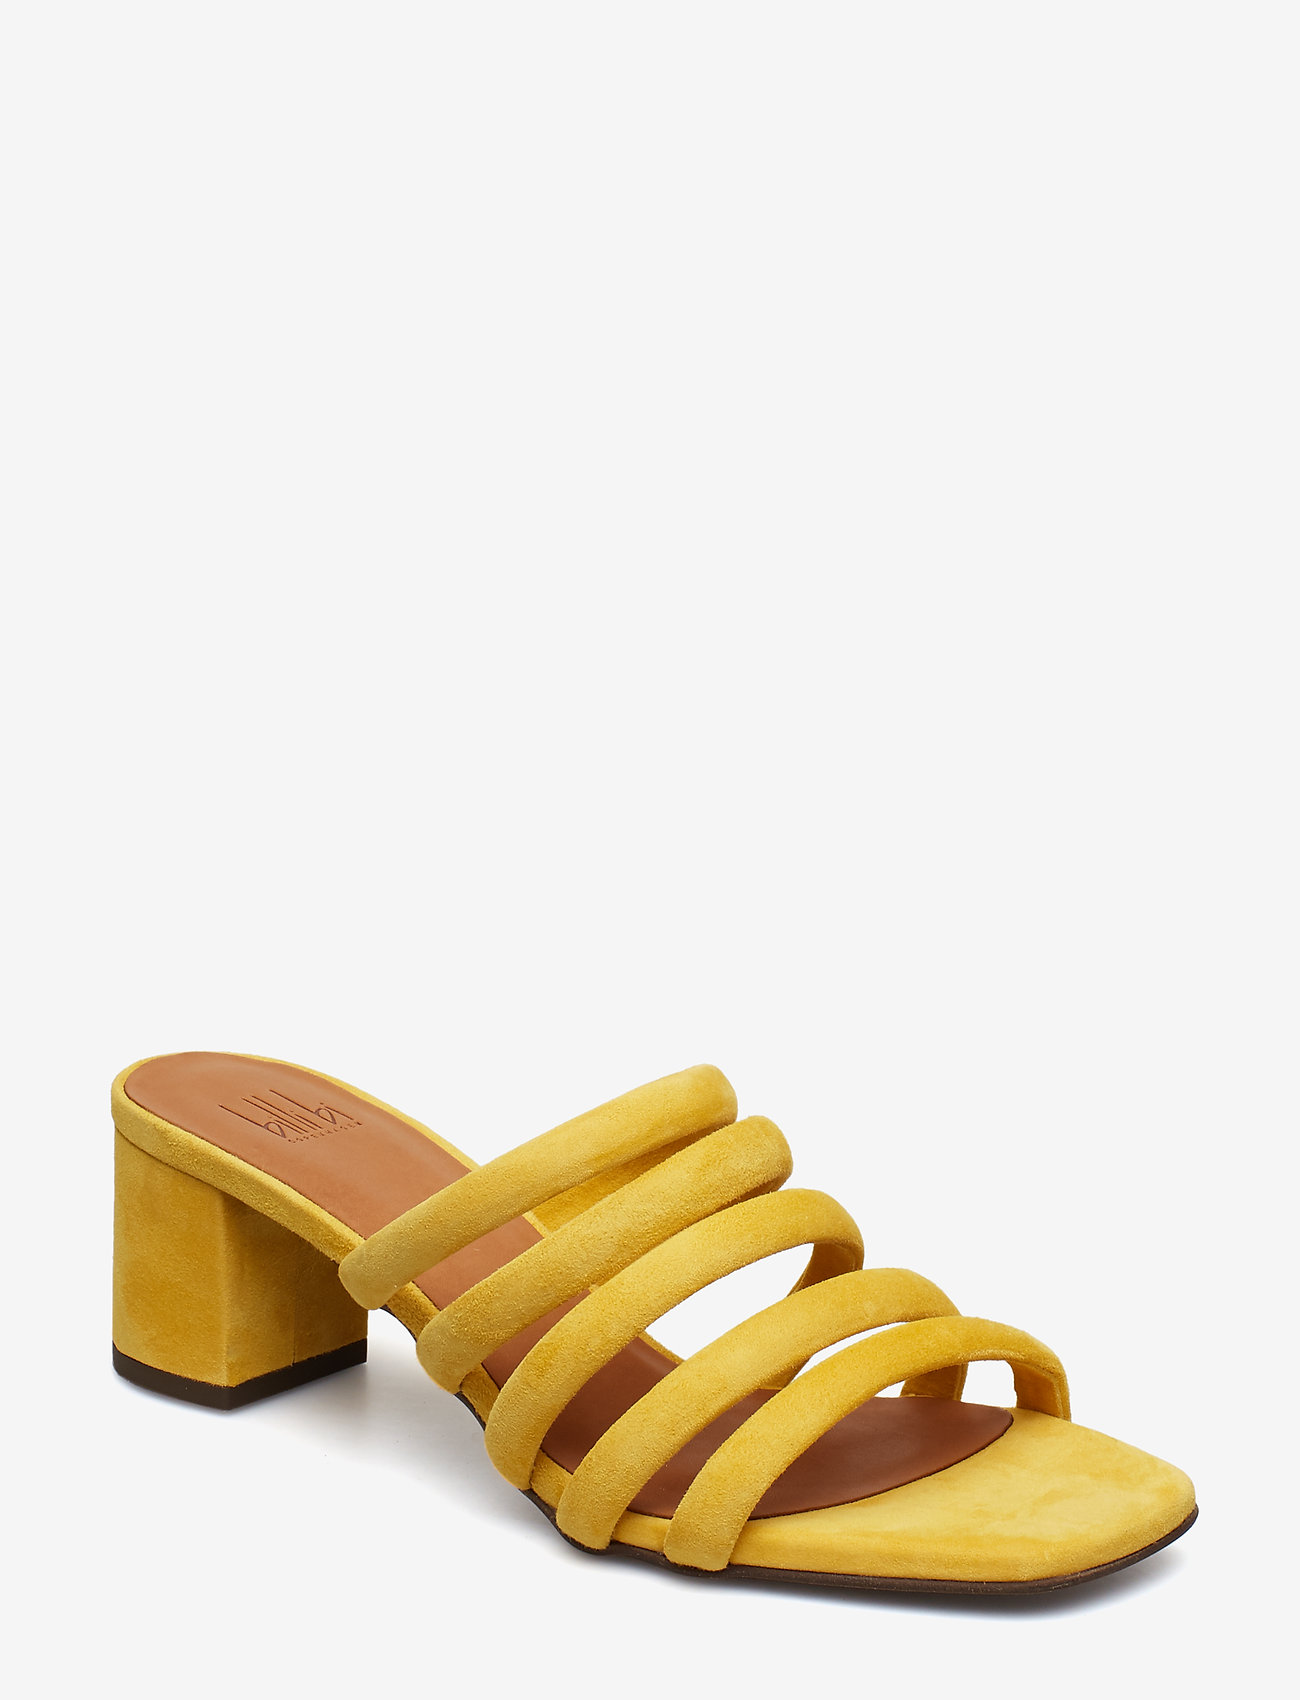 Billi Bi - SANDALS 8723 - heeled sandals - yellow 1795 suede 55 - 0